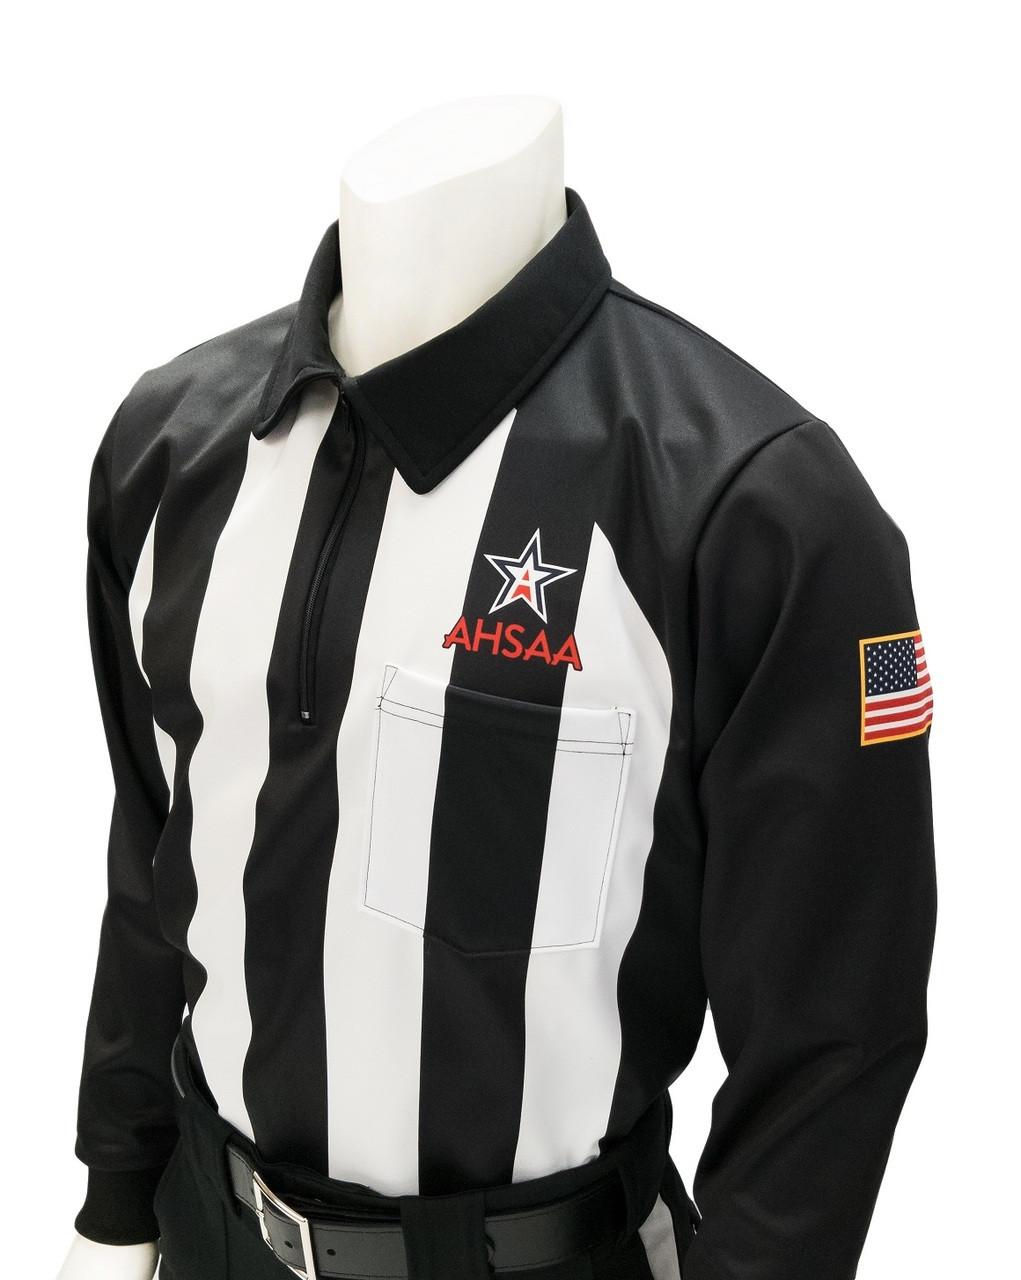 Alabama AHSAA Long Sleeve Football Referee Shirt